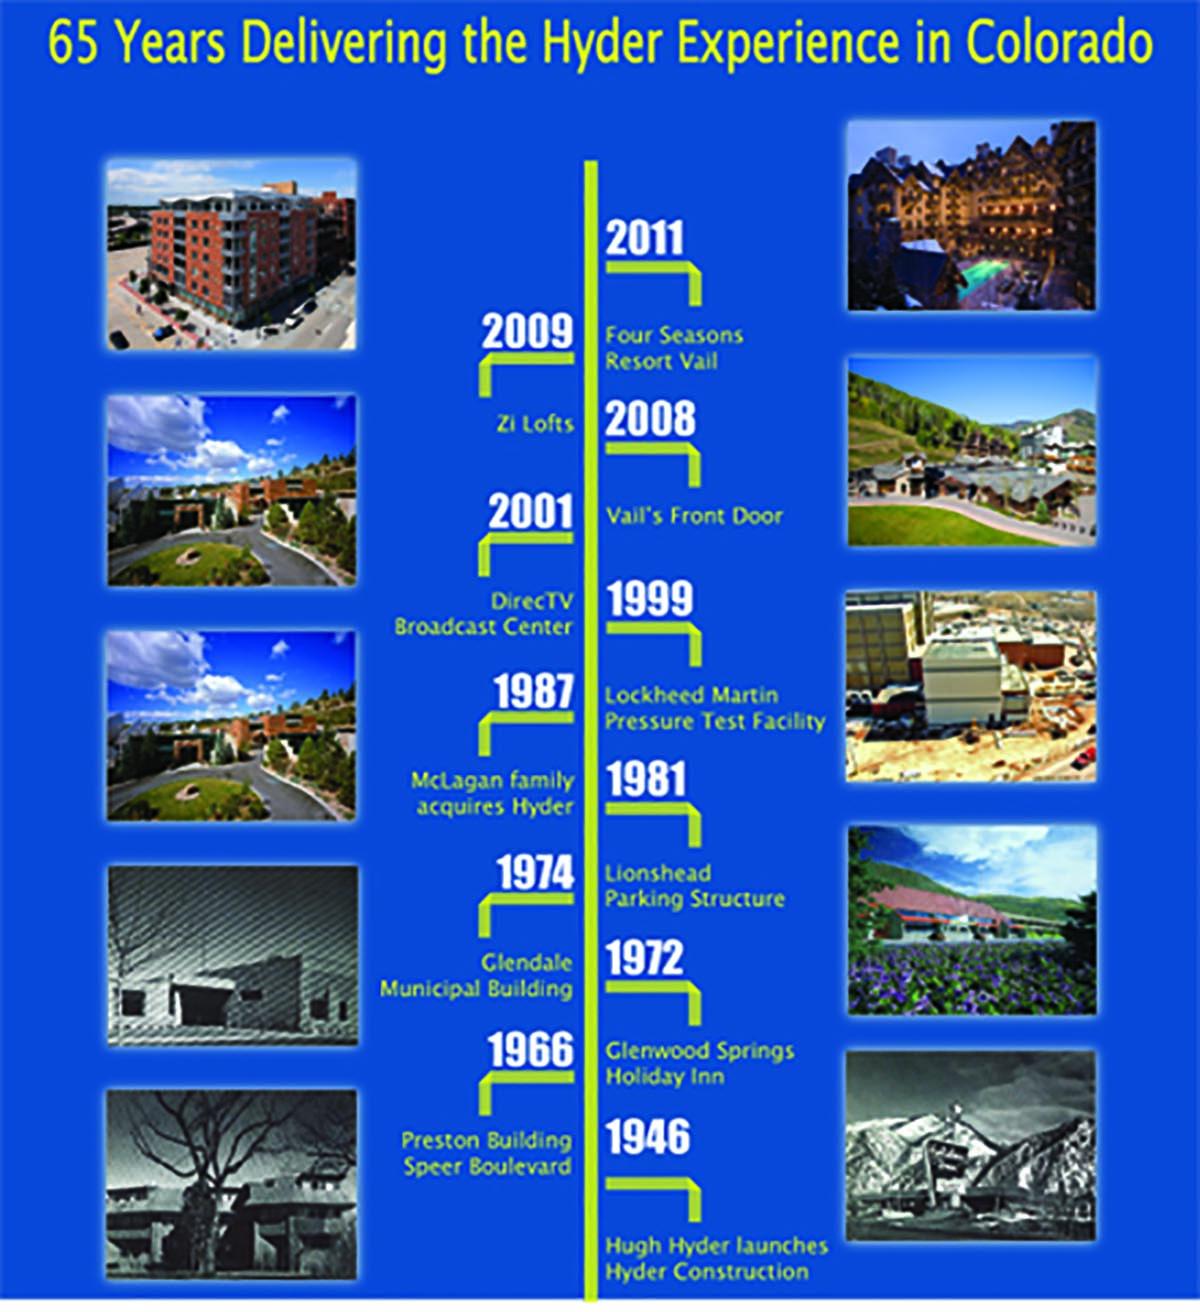 Hyder Celebrates 65th Anniversary   May 6, 2011